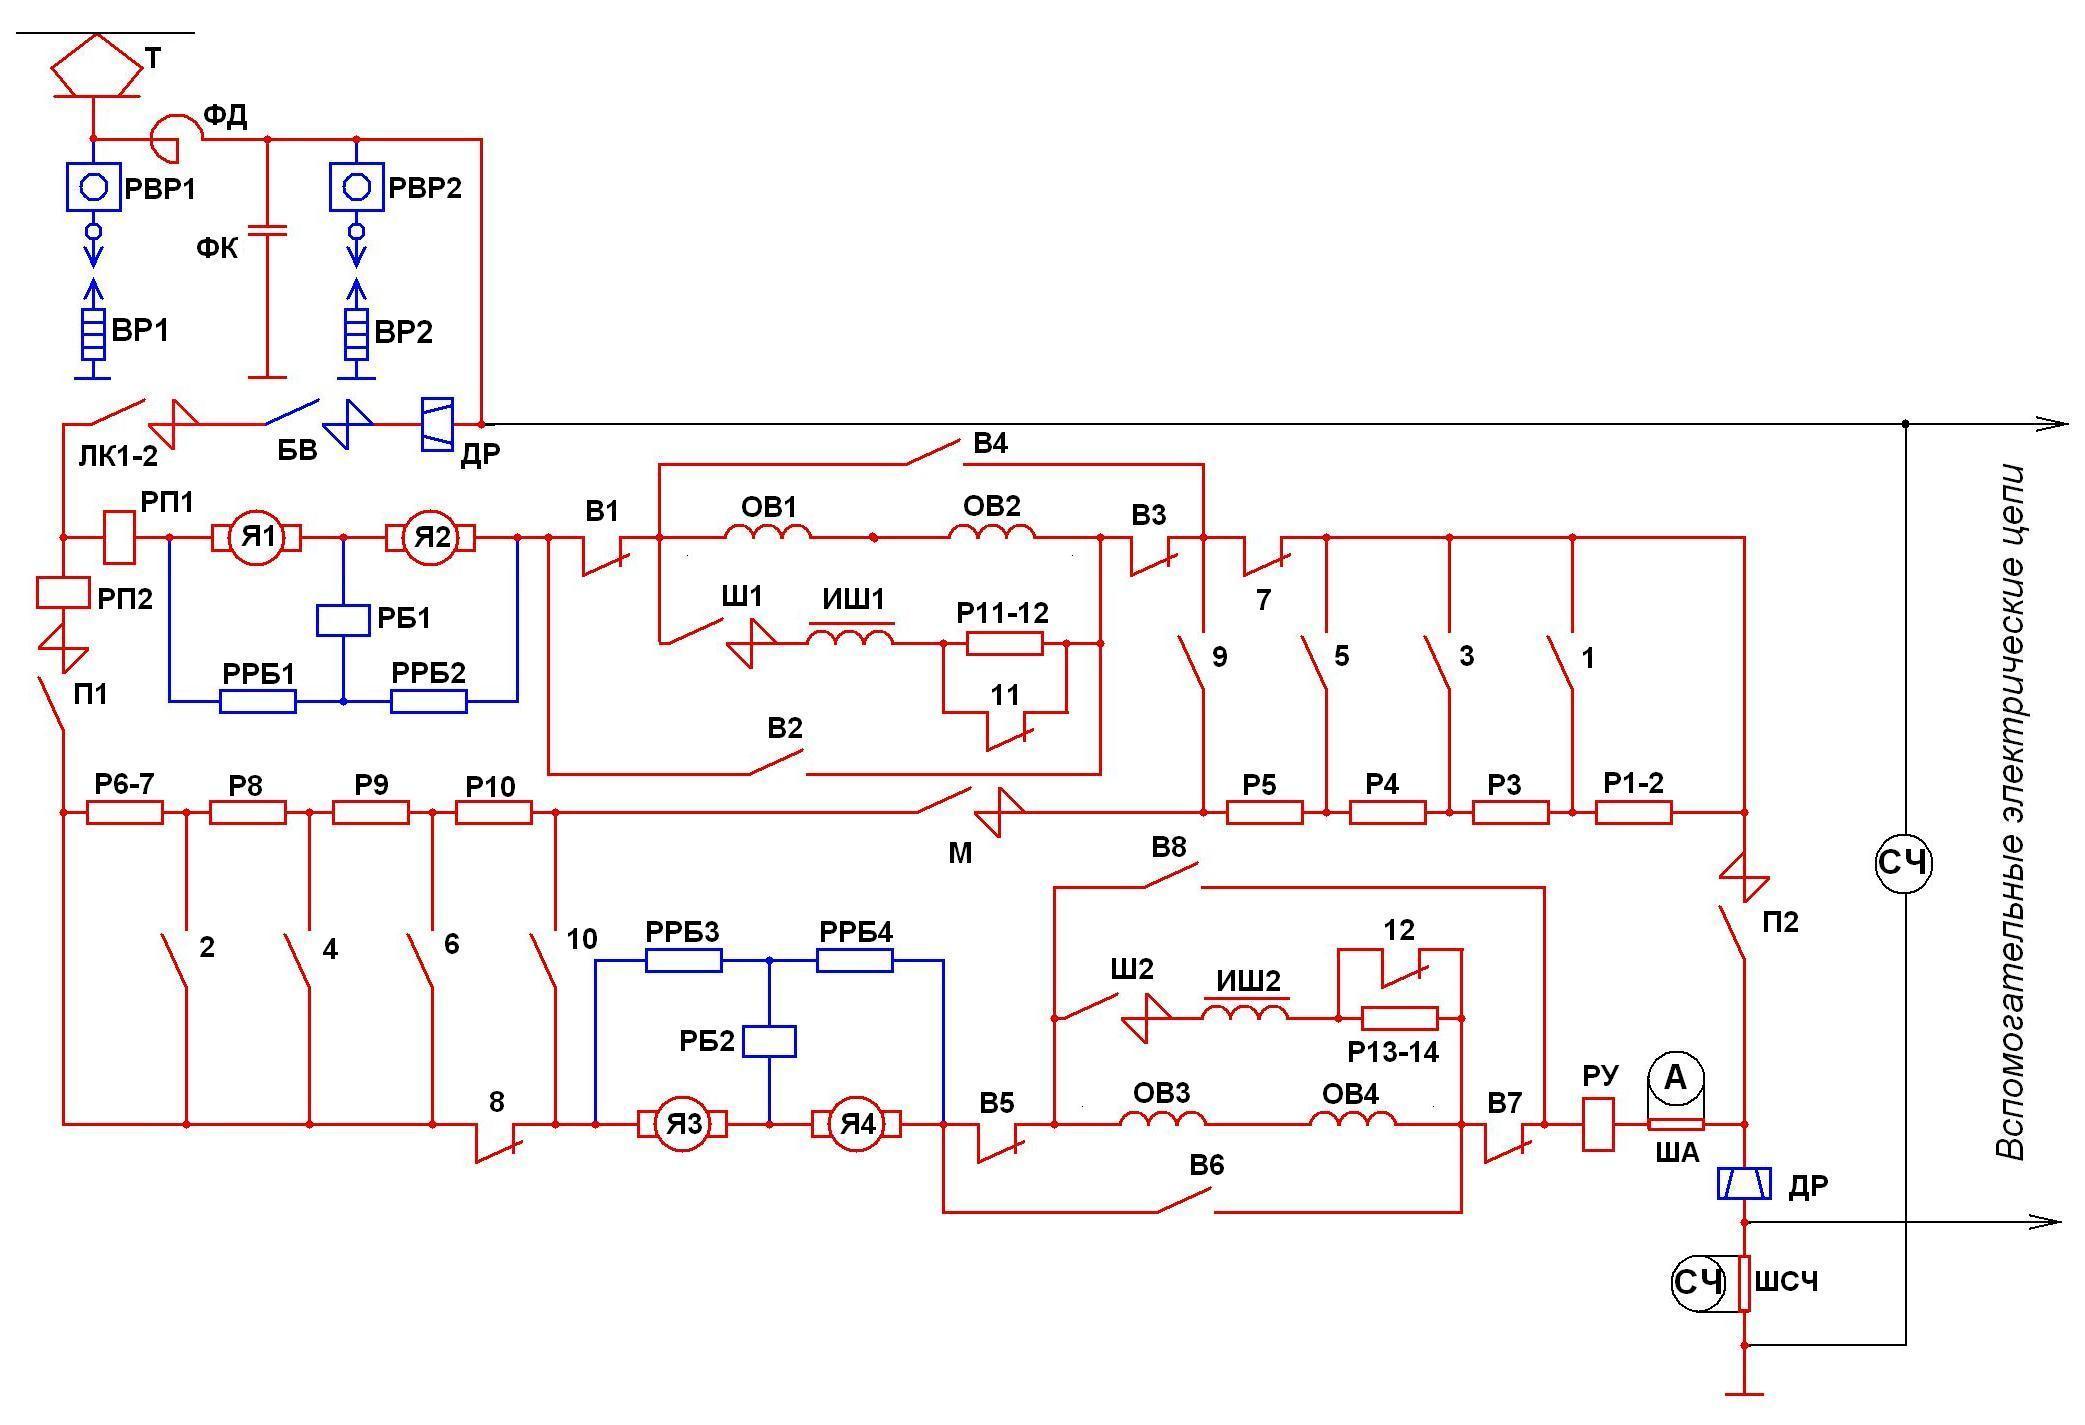 Parts Of A Plot Diagram: Silovaia shema ER2.jpg - Wikimedia Commons,Chart